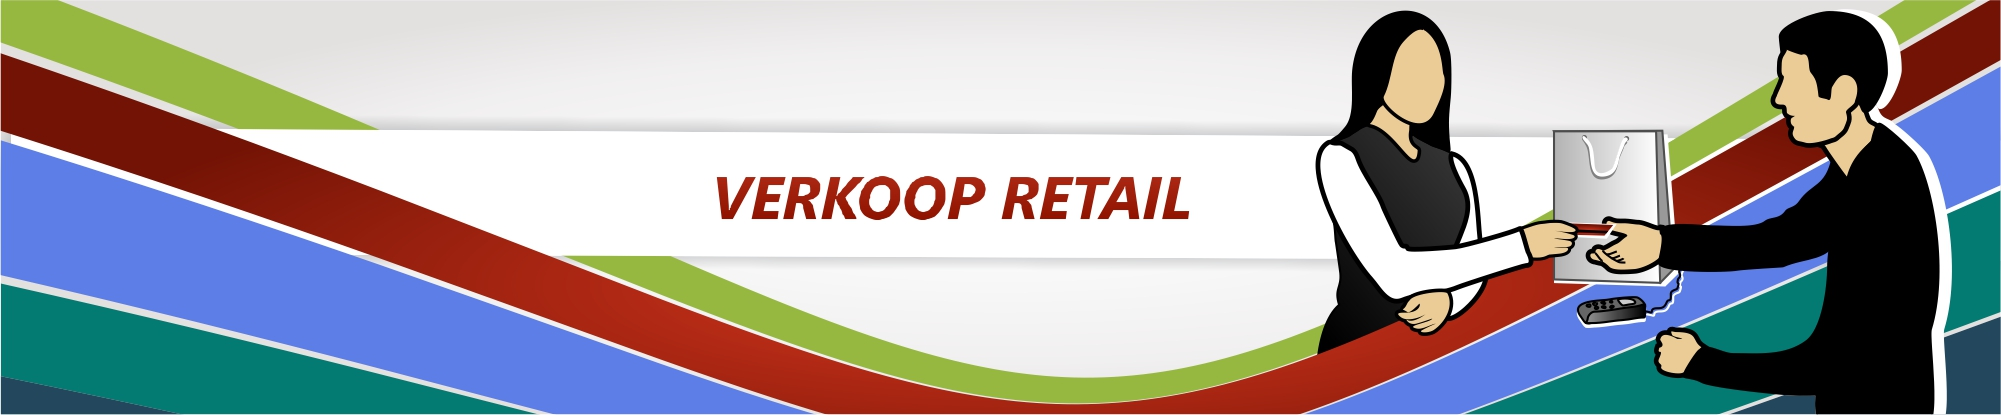 verkoop retail